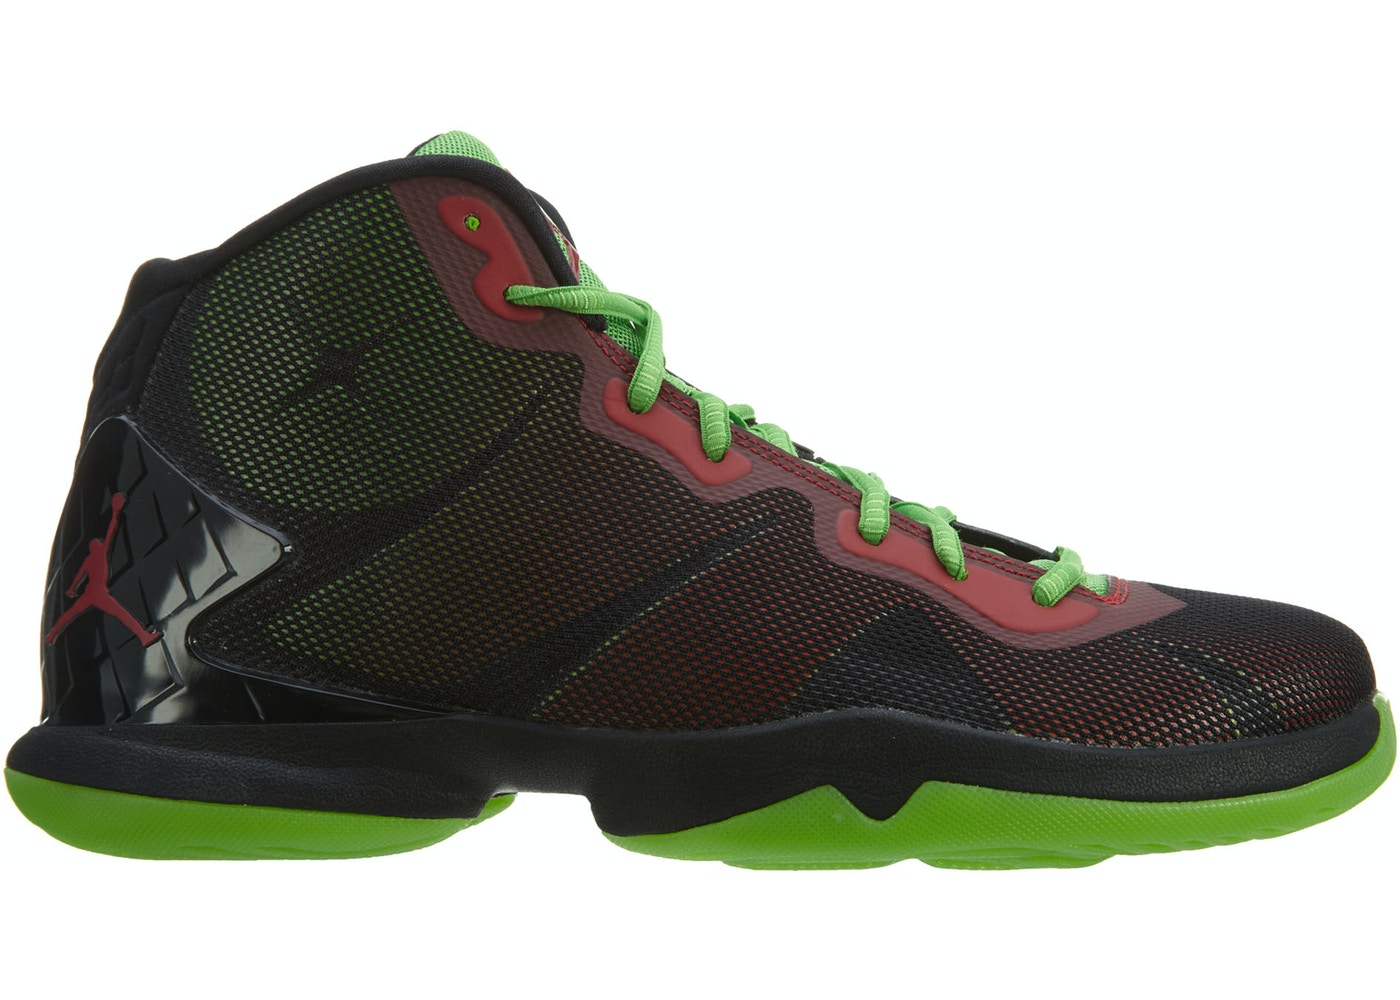 58c991dd21b875 Jordan Super.Fly 4 Black Gym Red-Green Pls-Infrared 23 - 768929-006